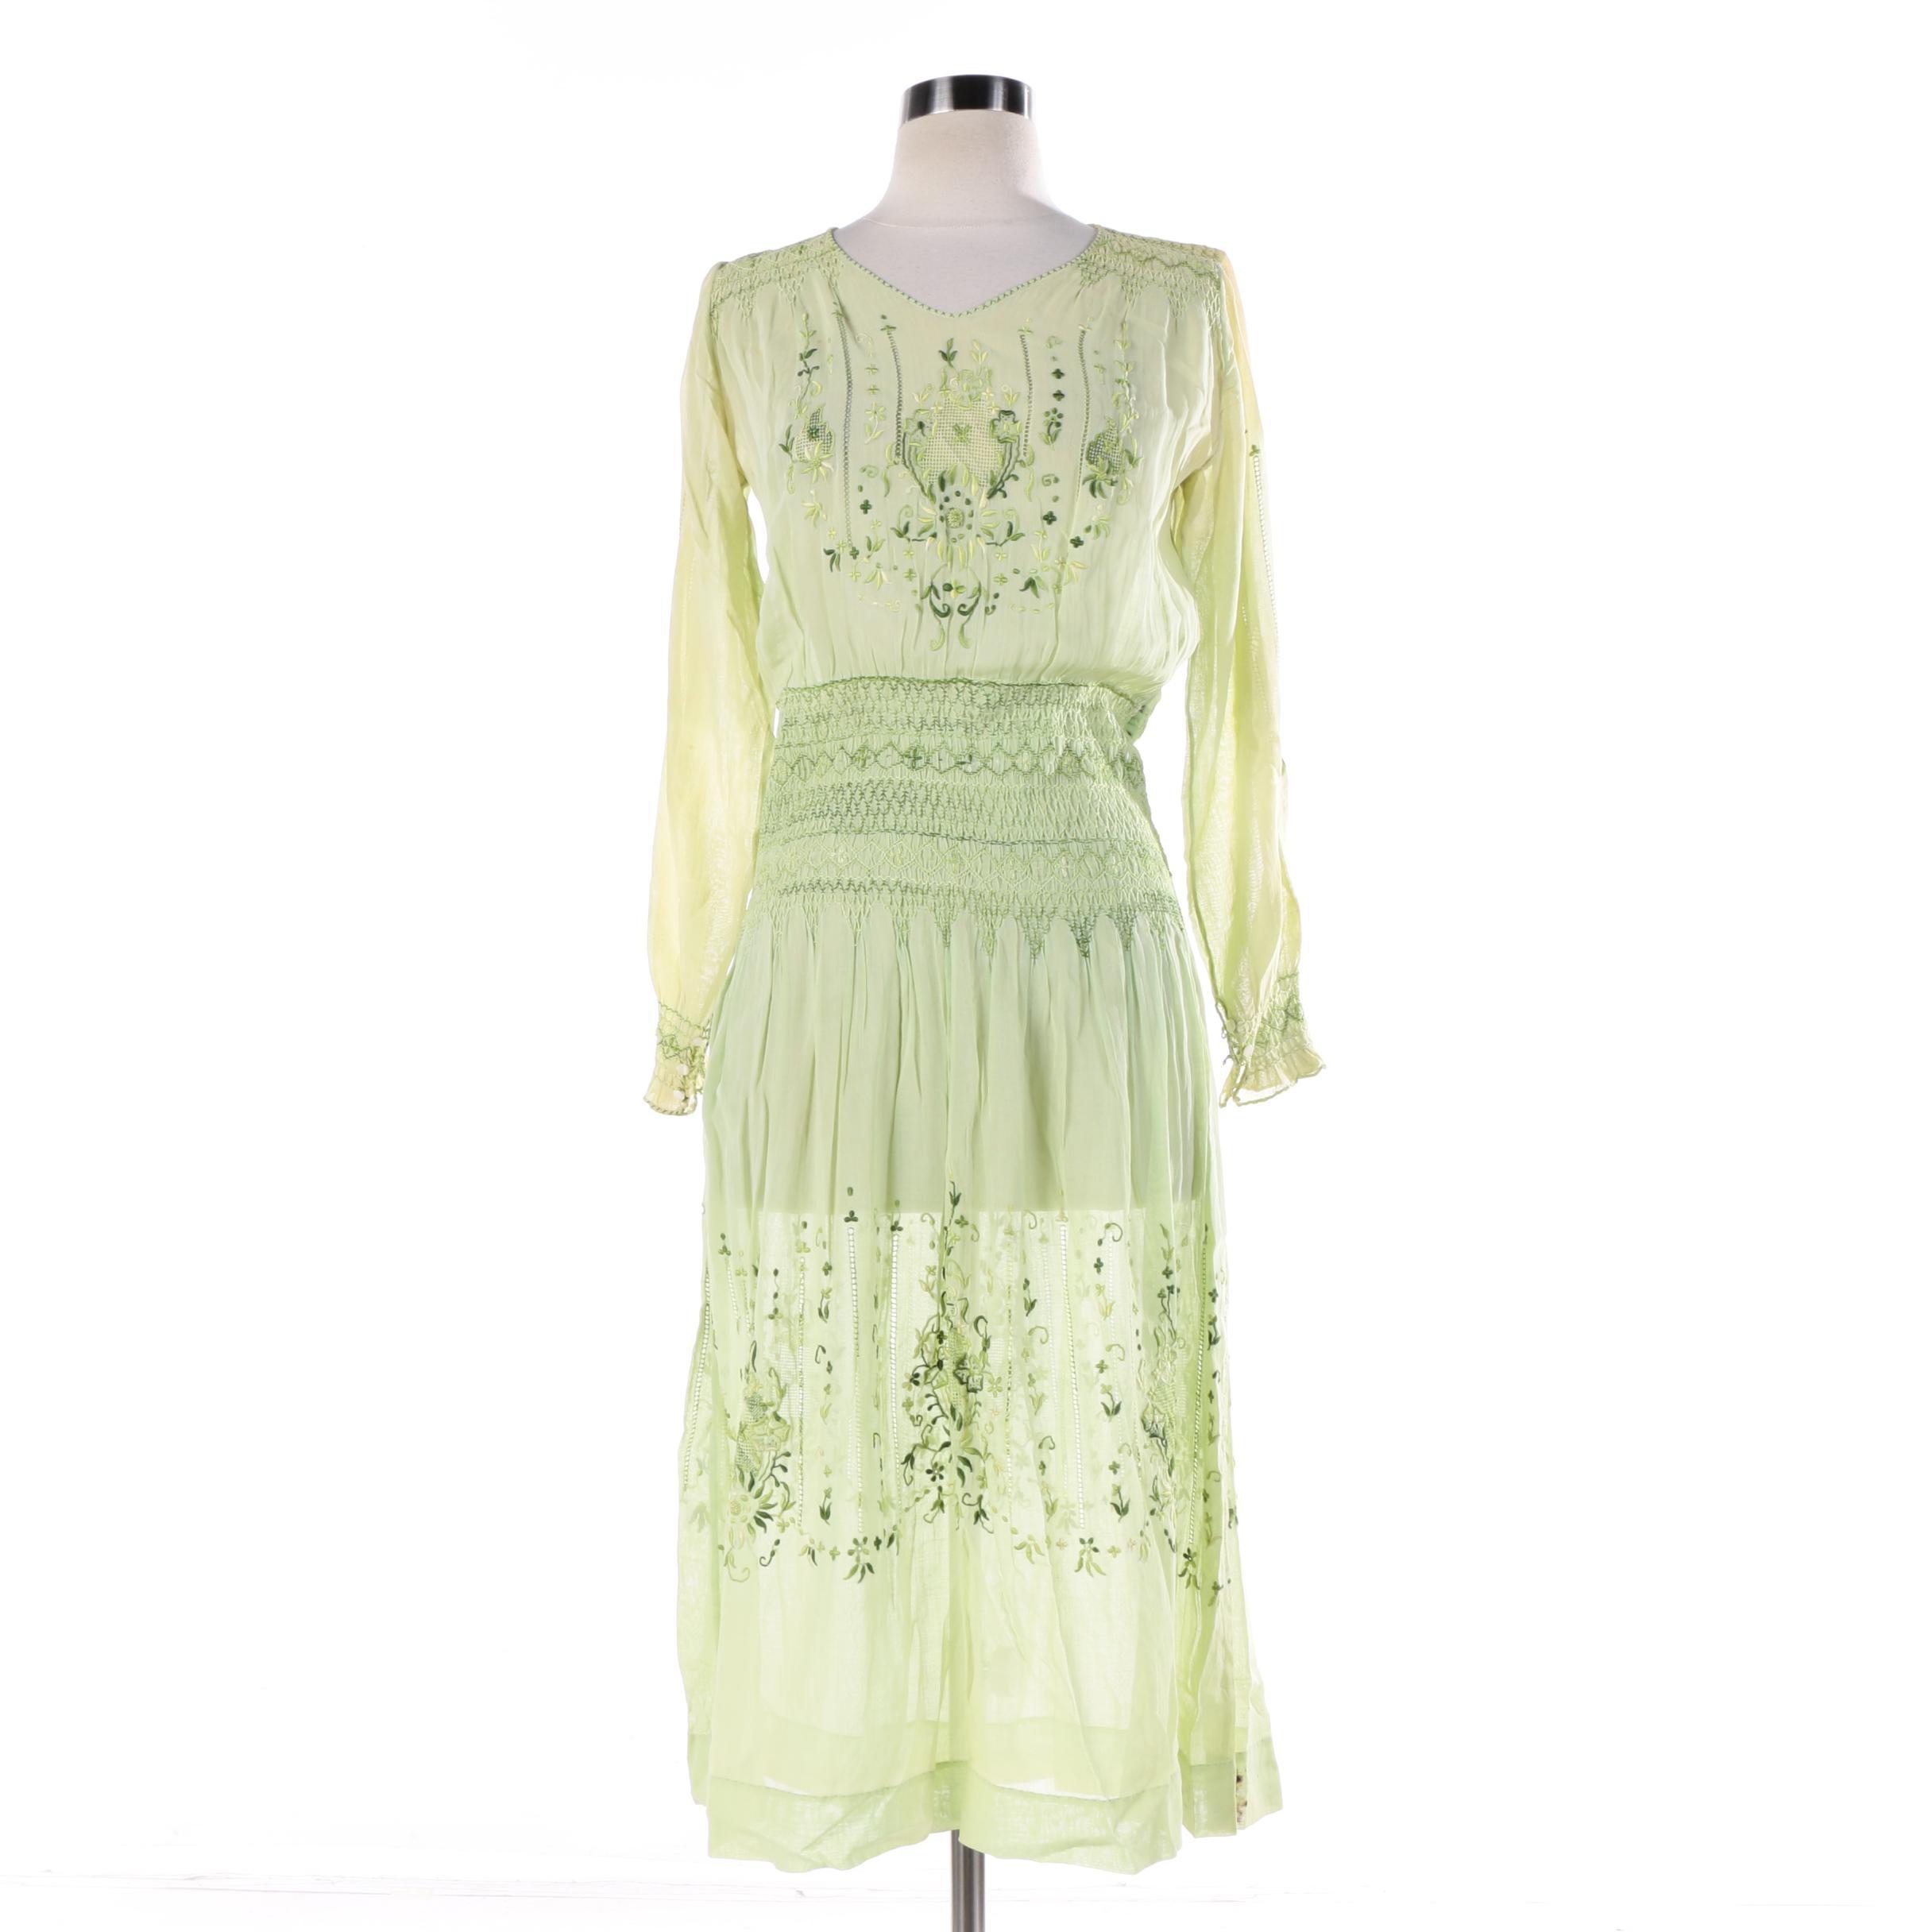 Vintage Embroidered Sheer Green Dress